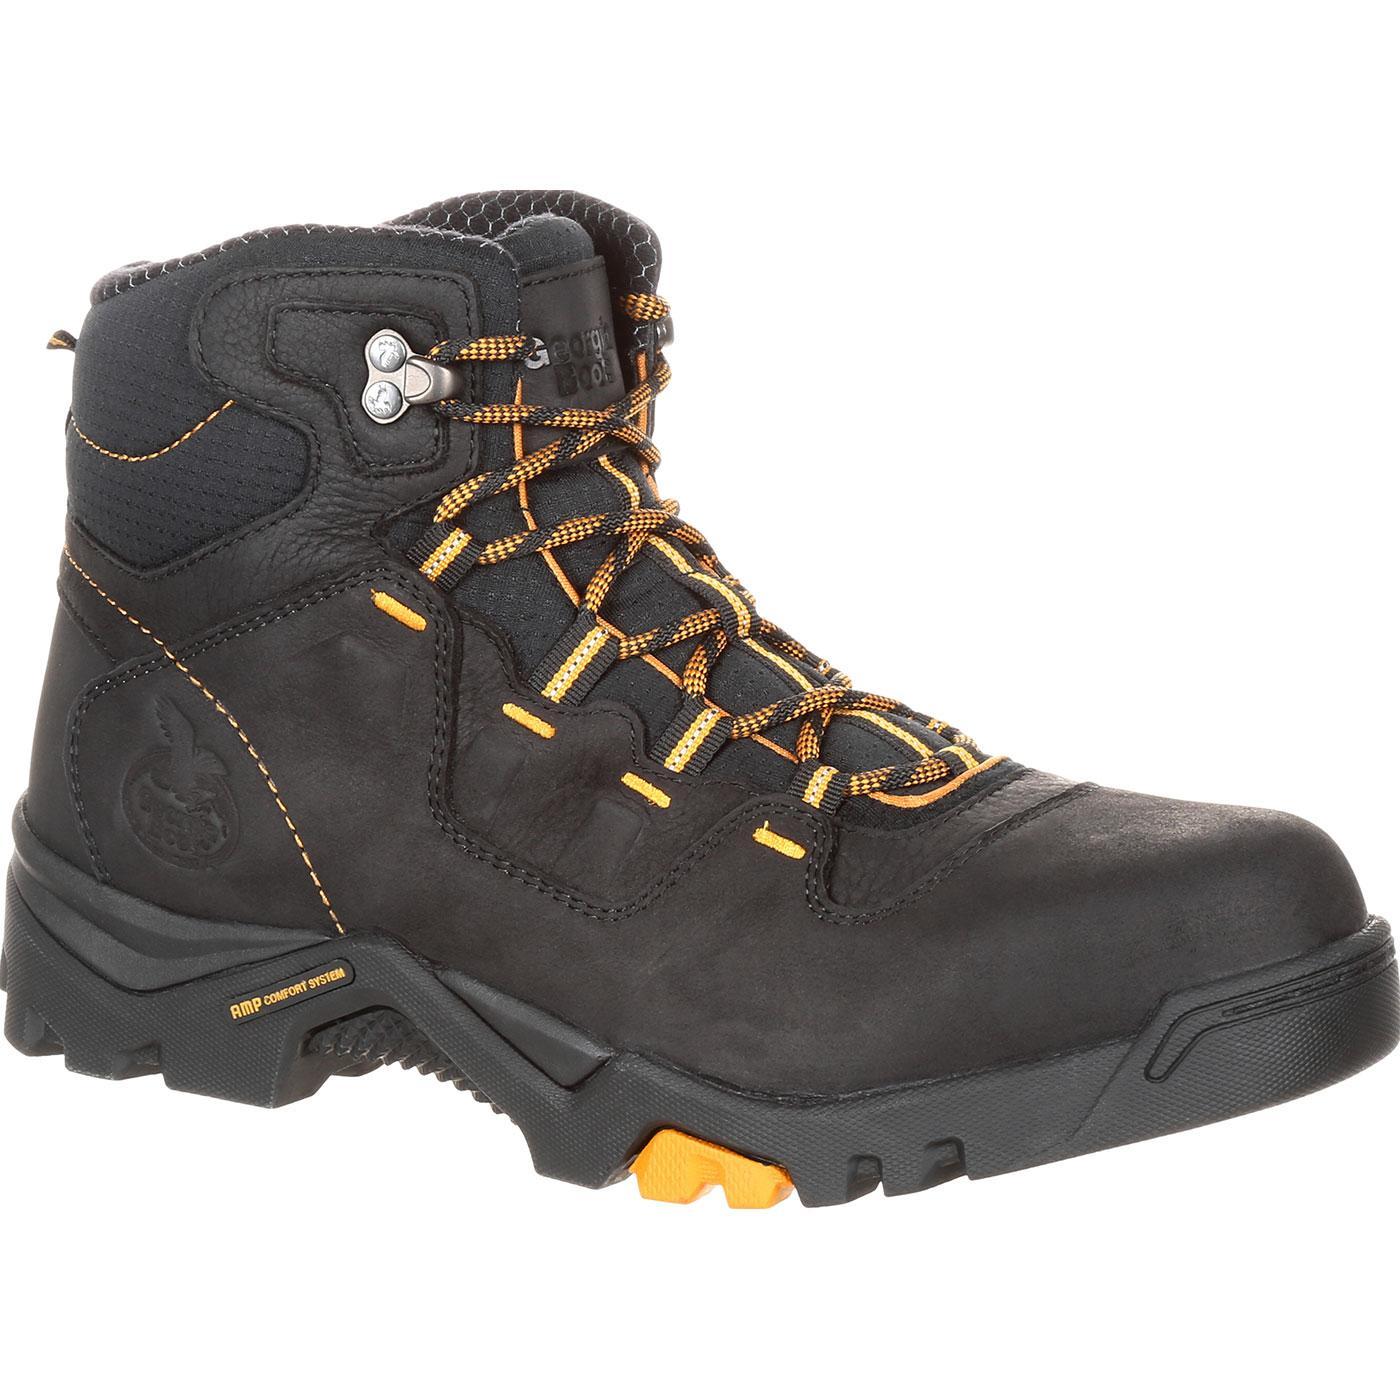 Gb00217 Georgia Boot Men S Amplitude Waterproof Work Boot